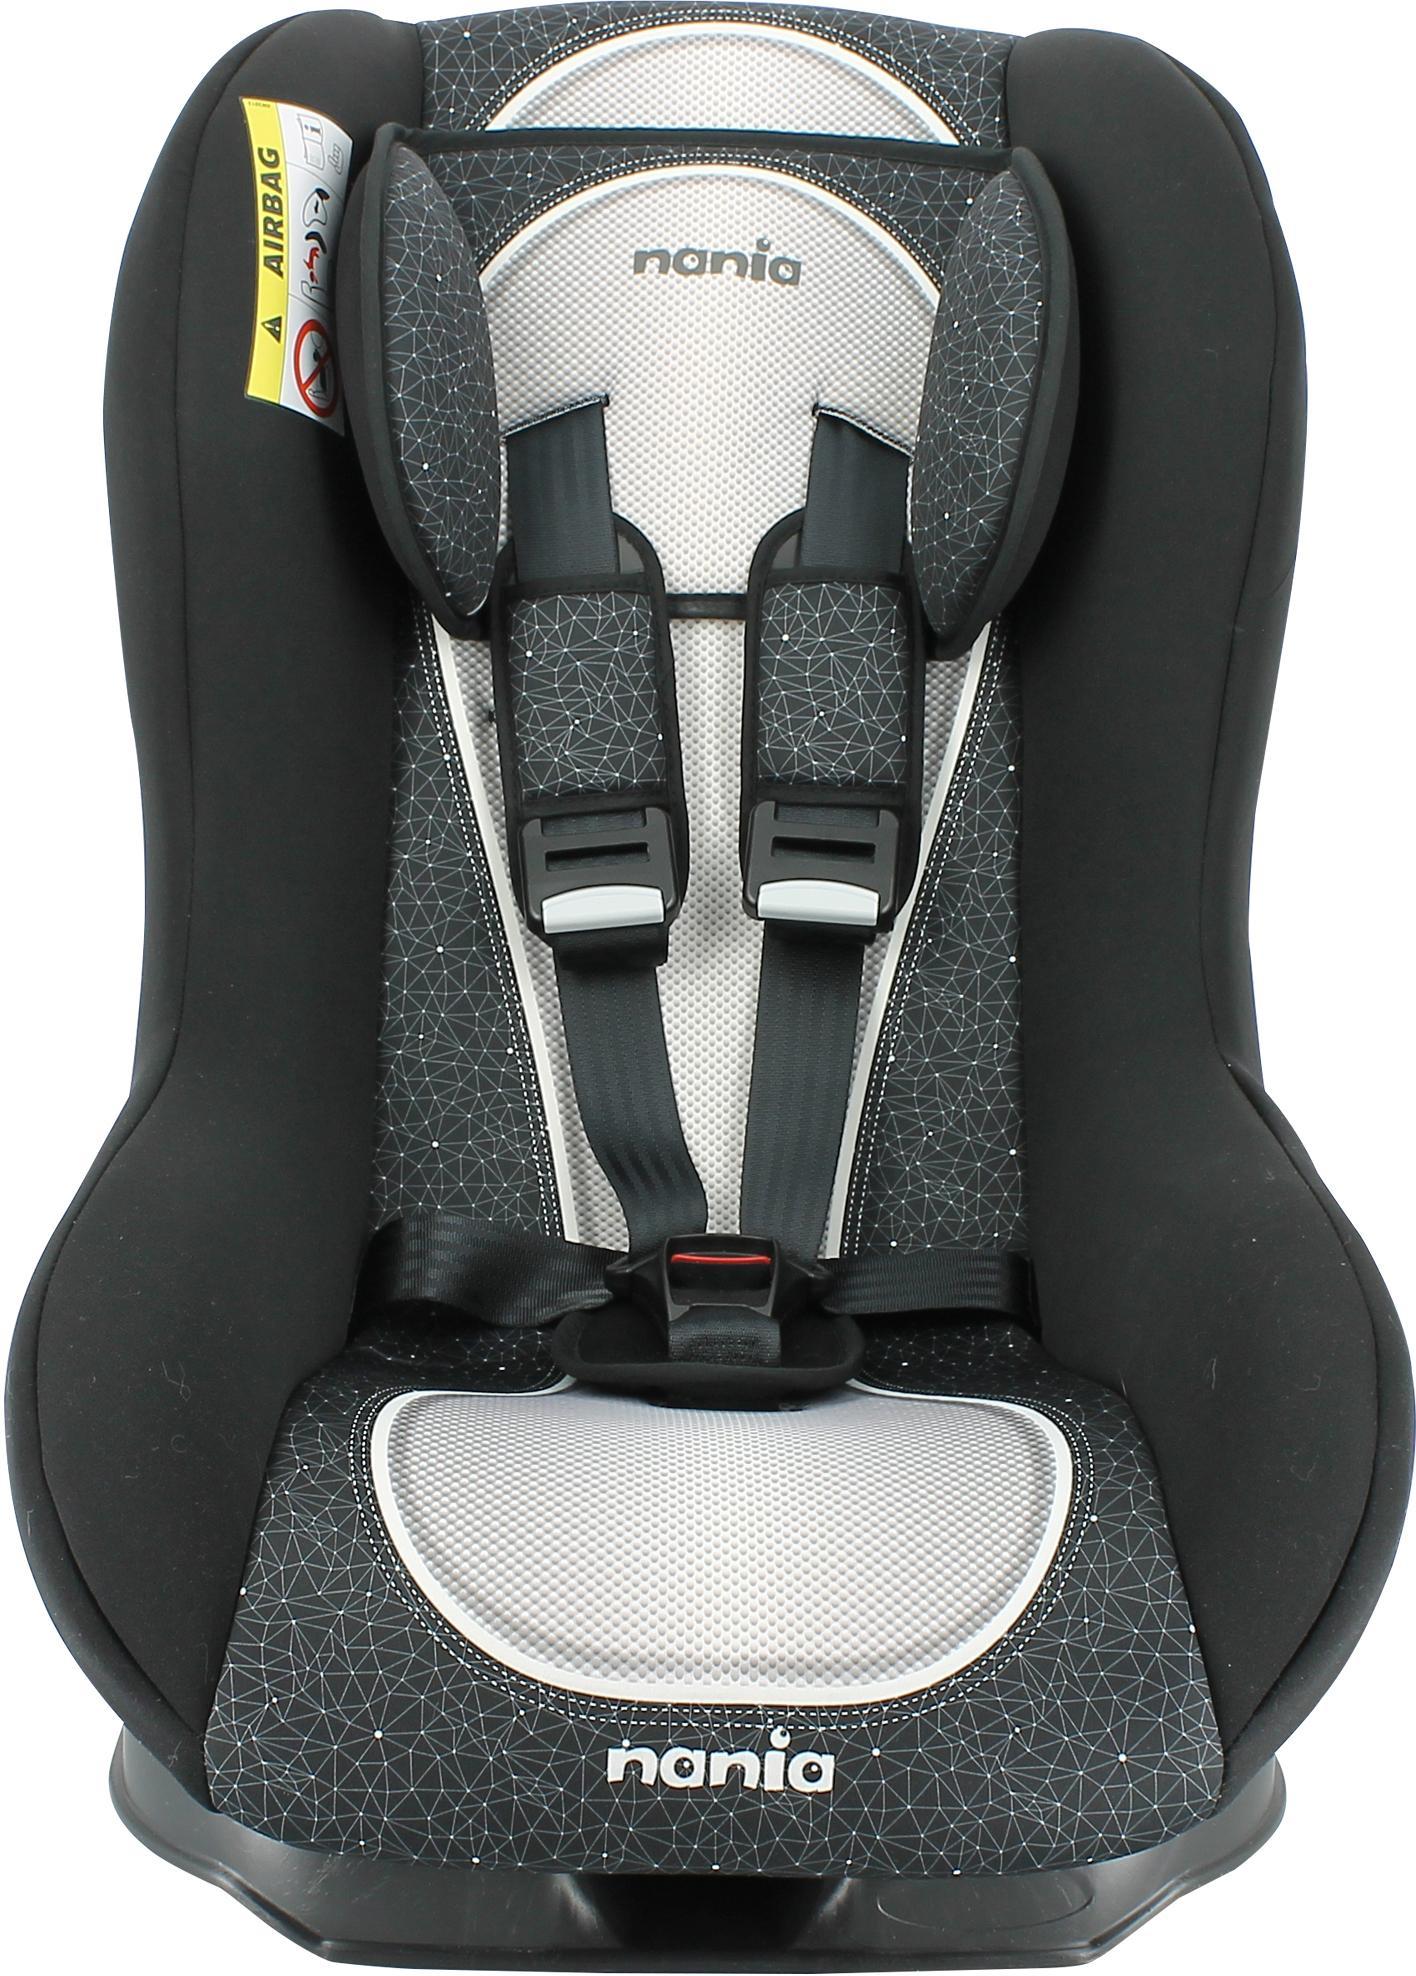 Maxim Skyline Baby Car Seat